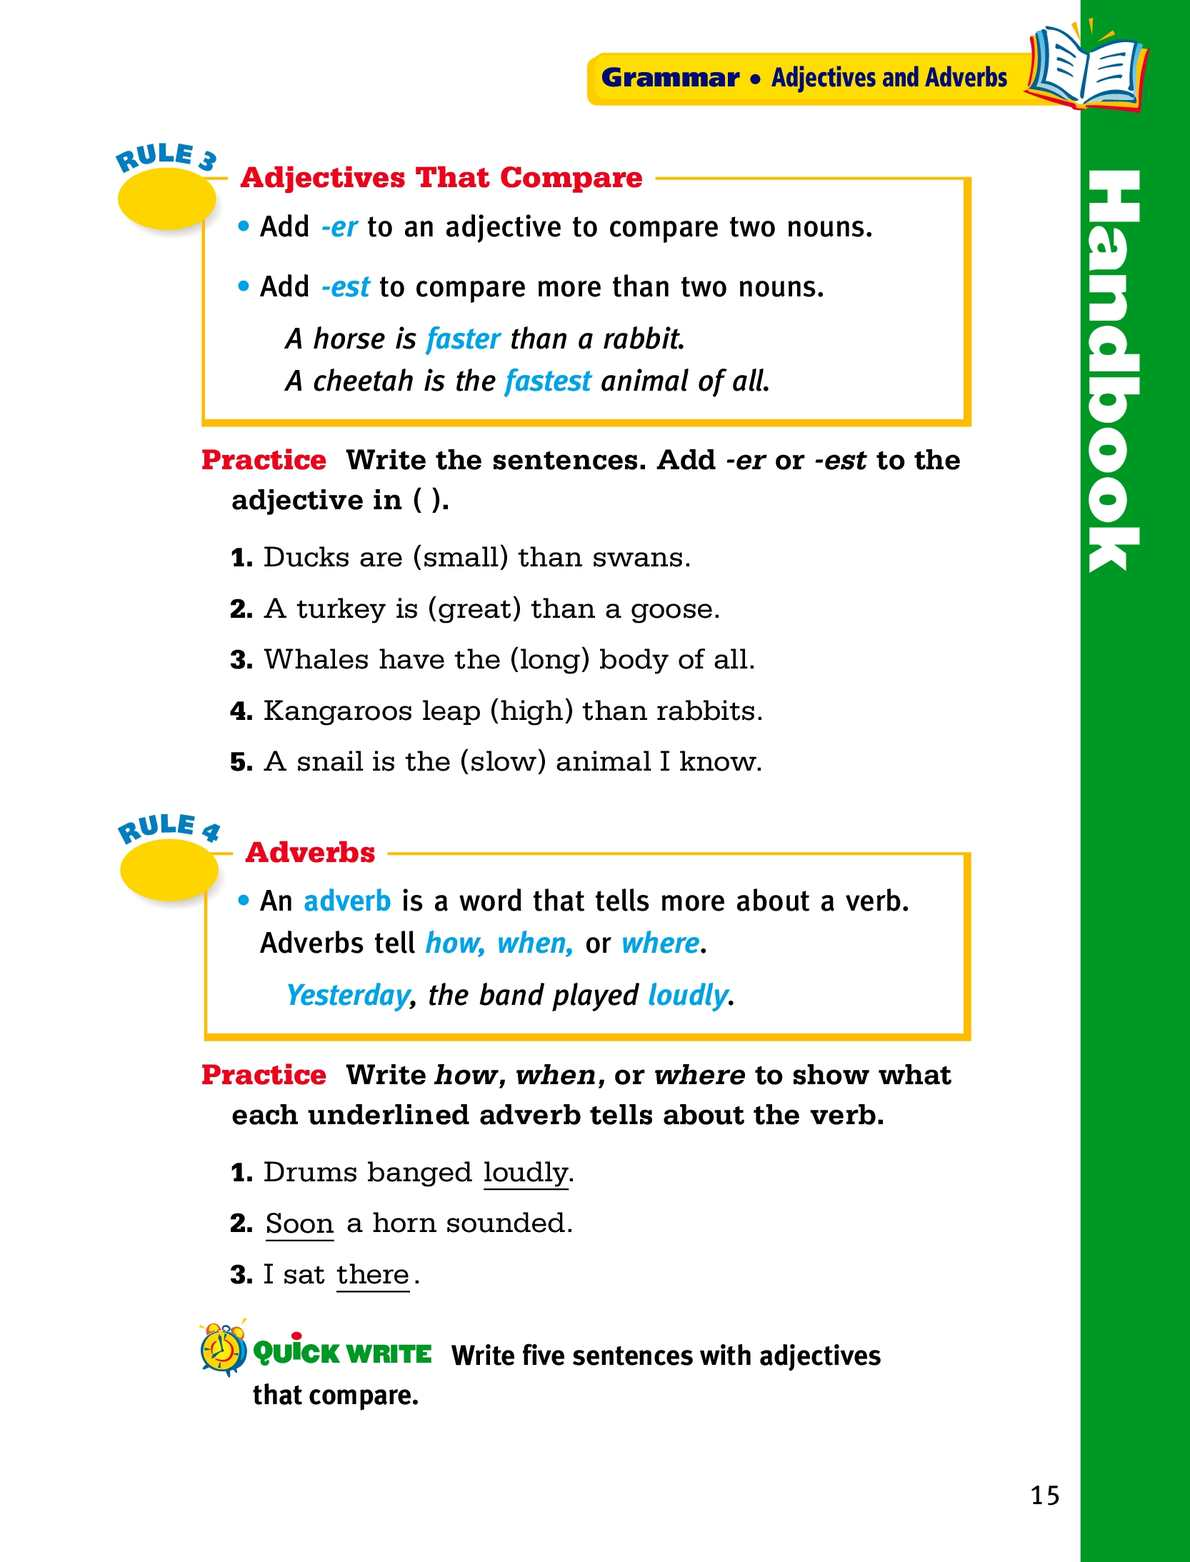 Grammar and Writing Handbook SE G2 - CALAMEO Downloader